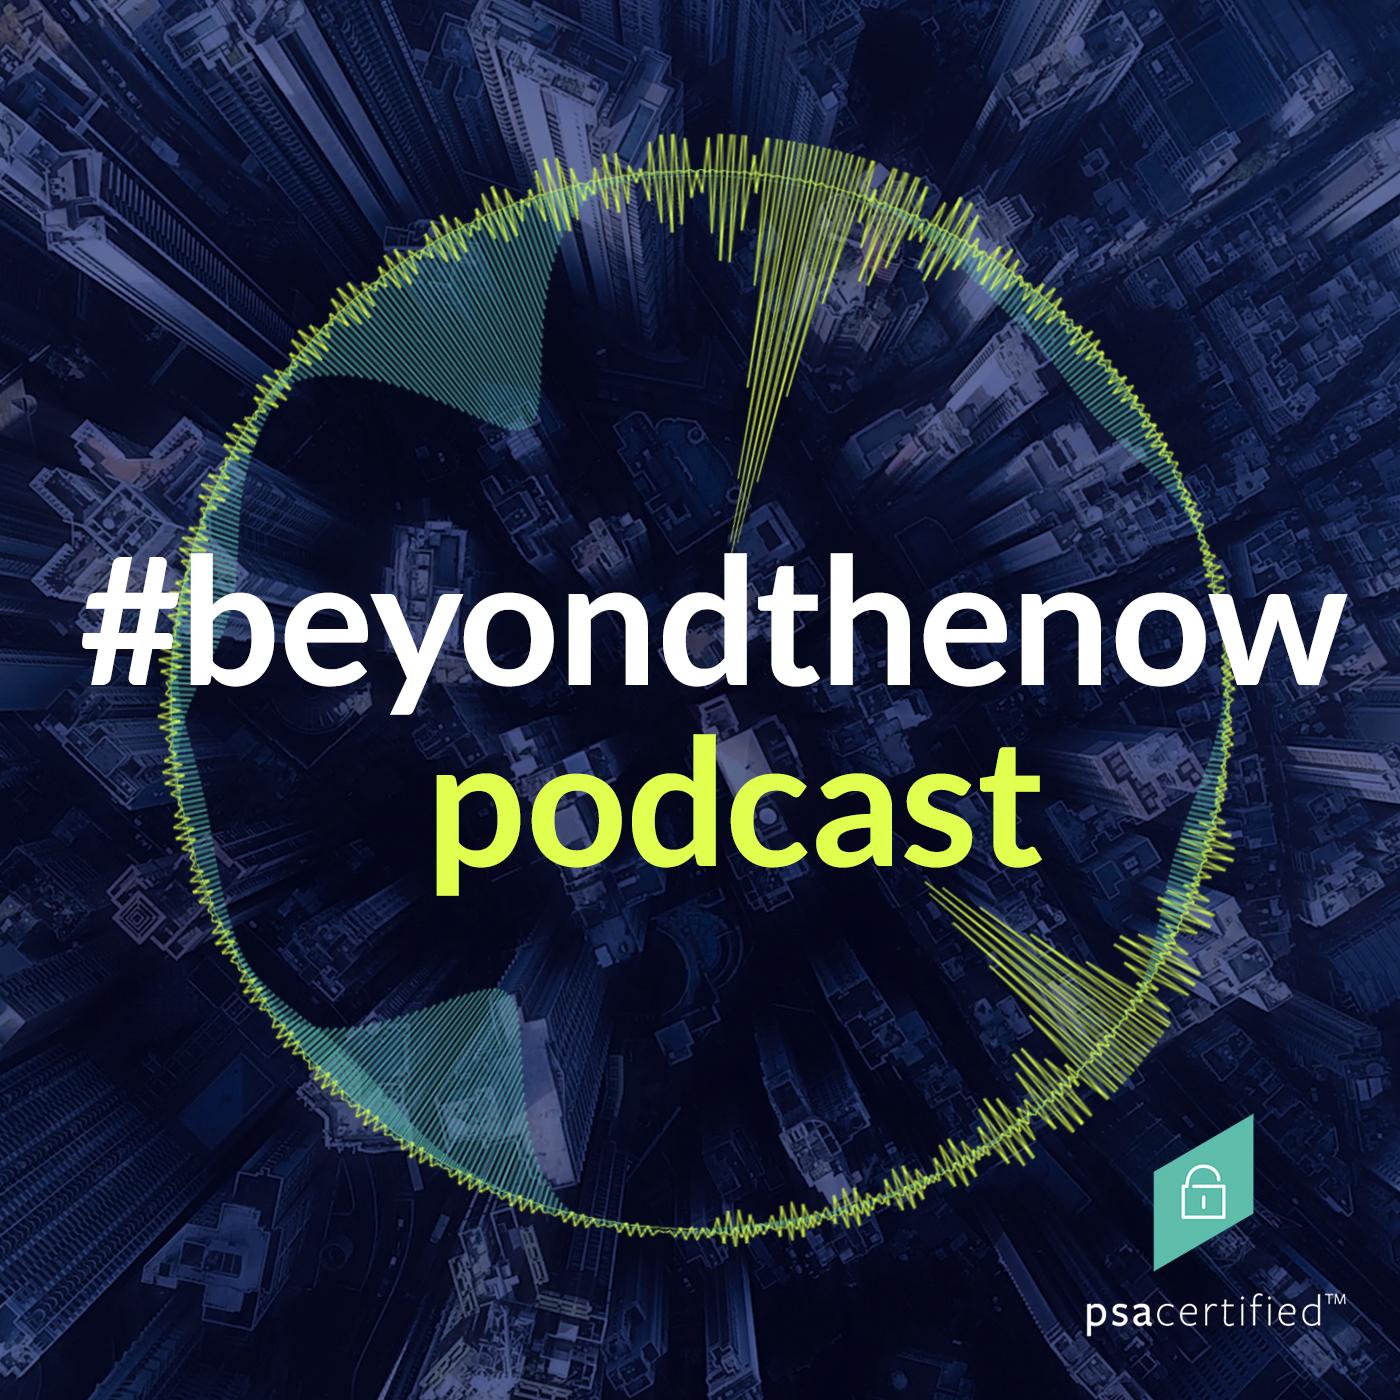 #beyondthenow Podcast